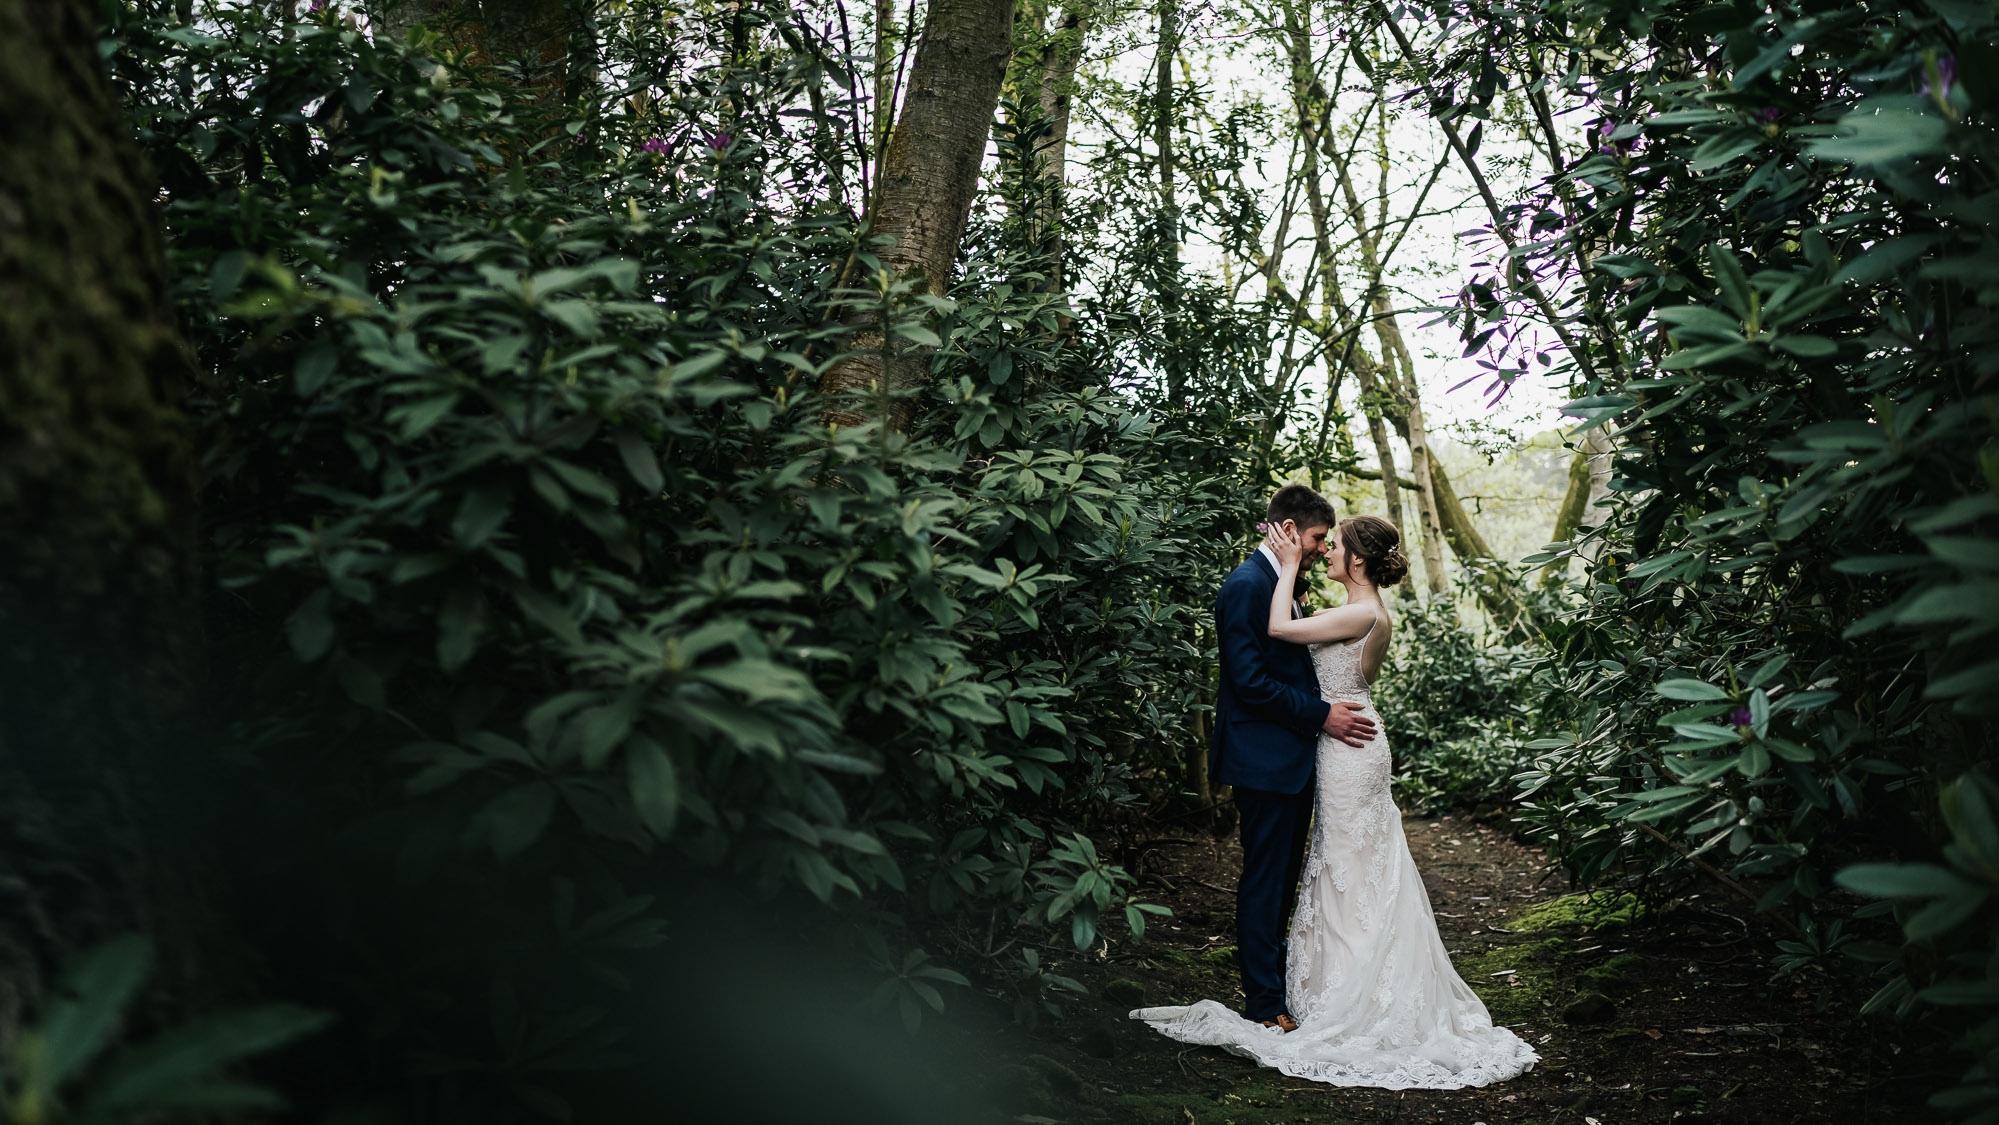 Nunsmere Hall Hotel Wedding photograhpy in cheshire wedding photographer (37 of 42).jpg